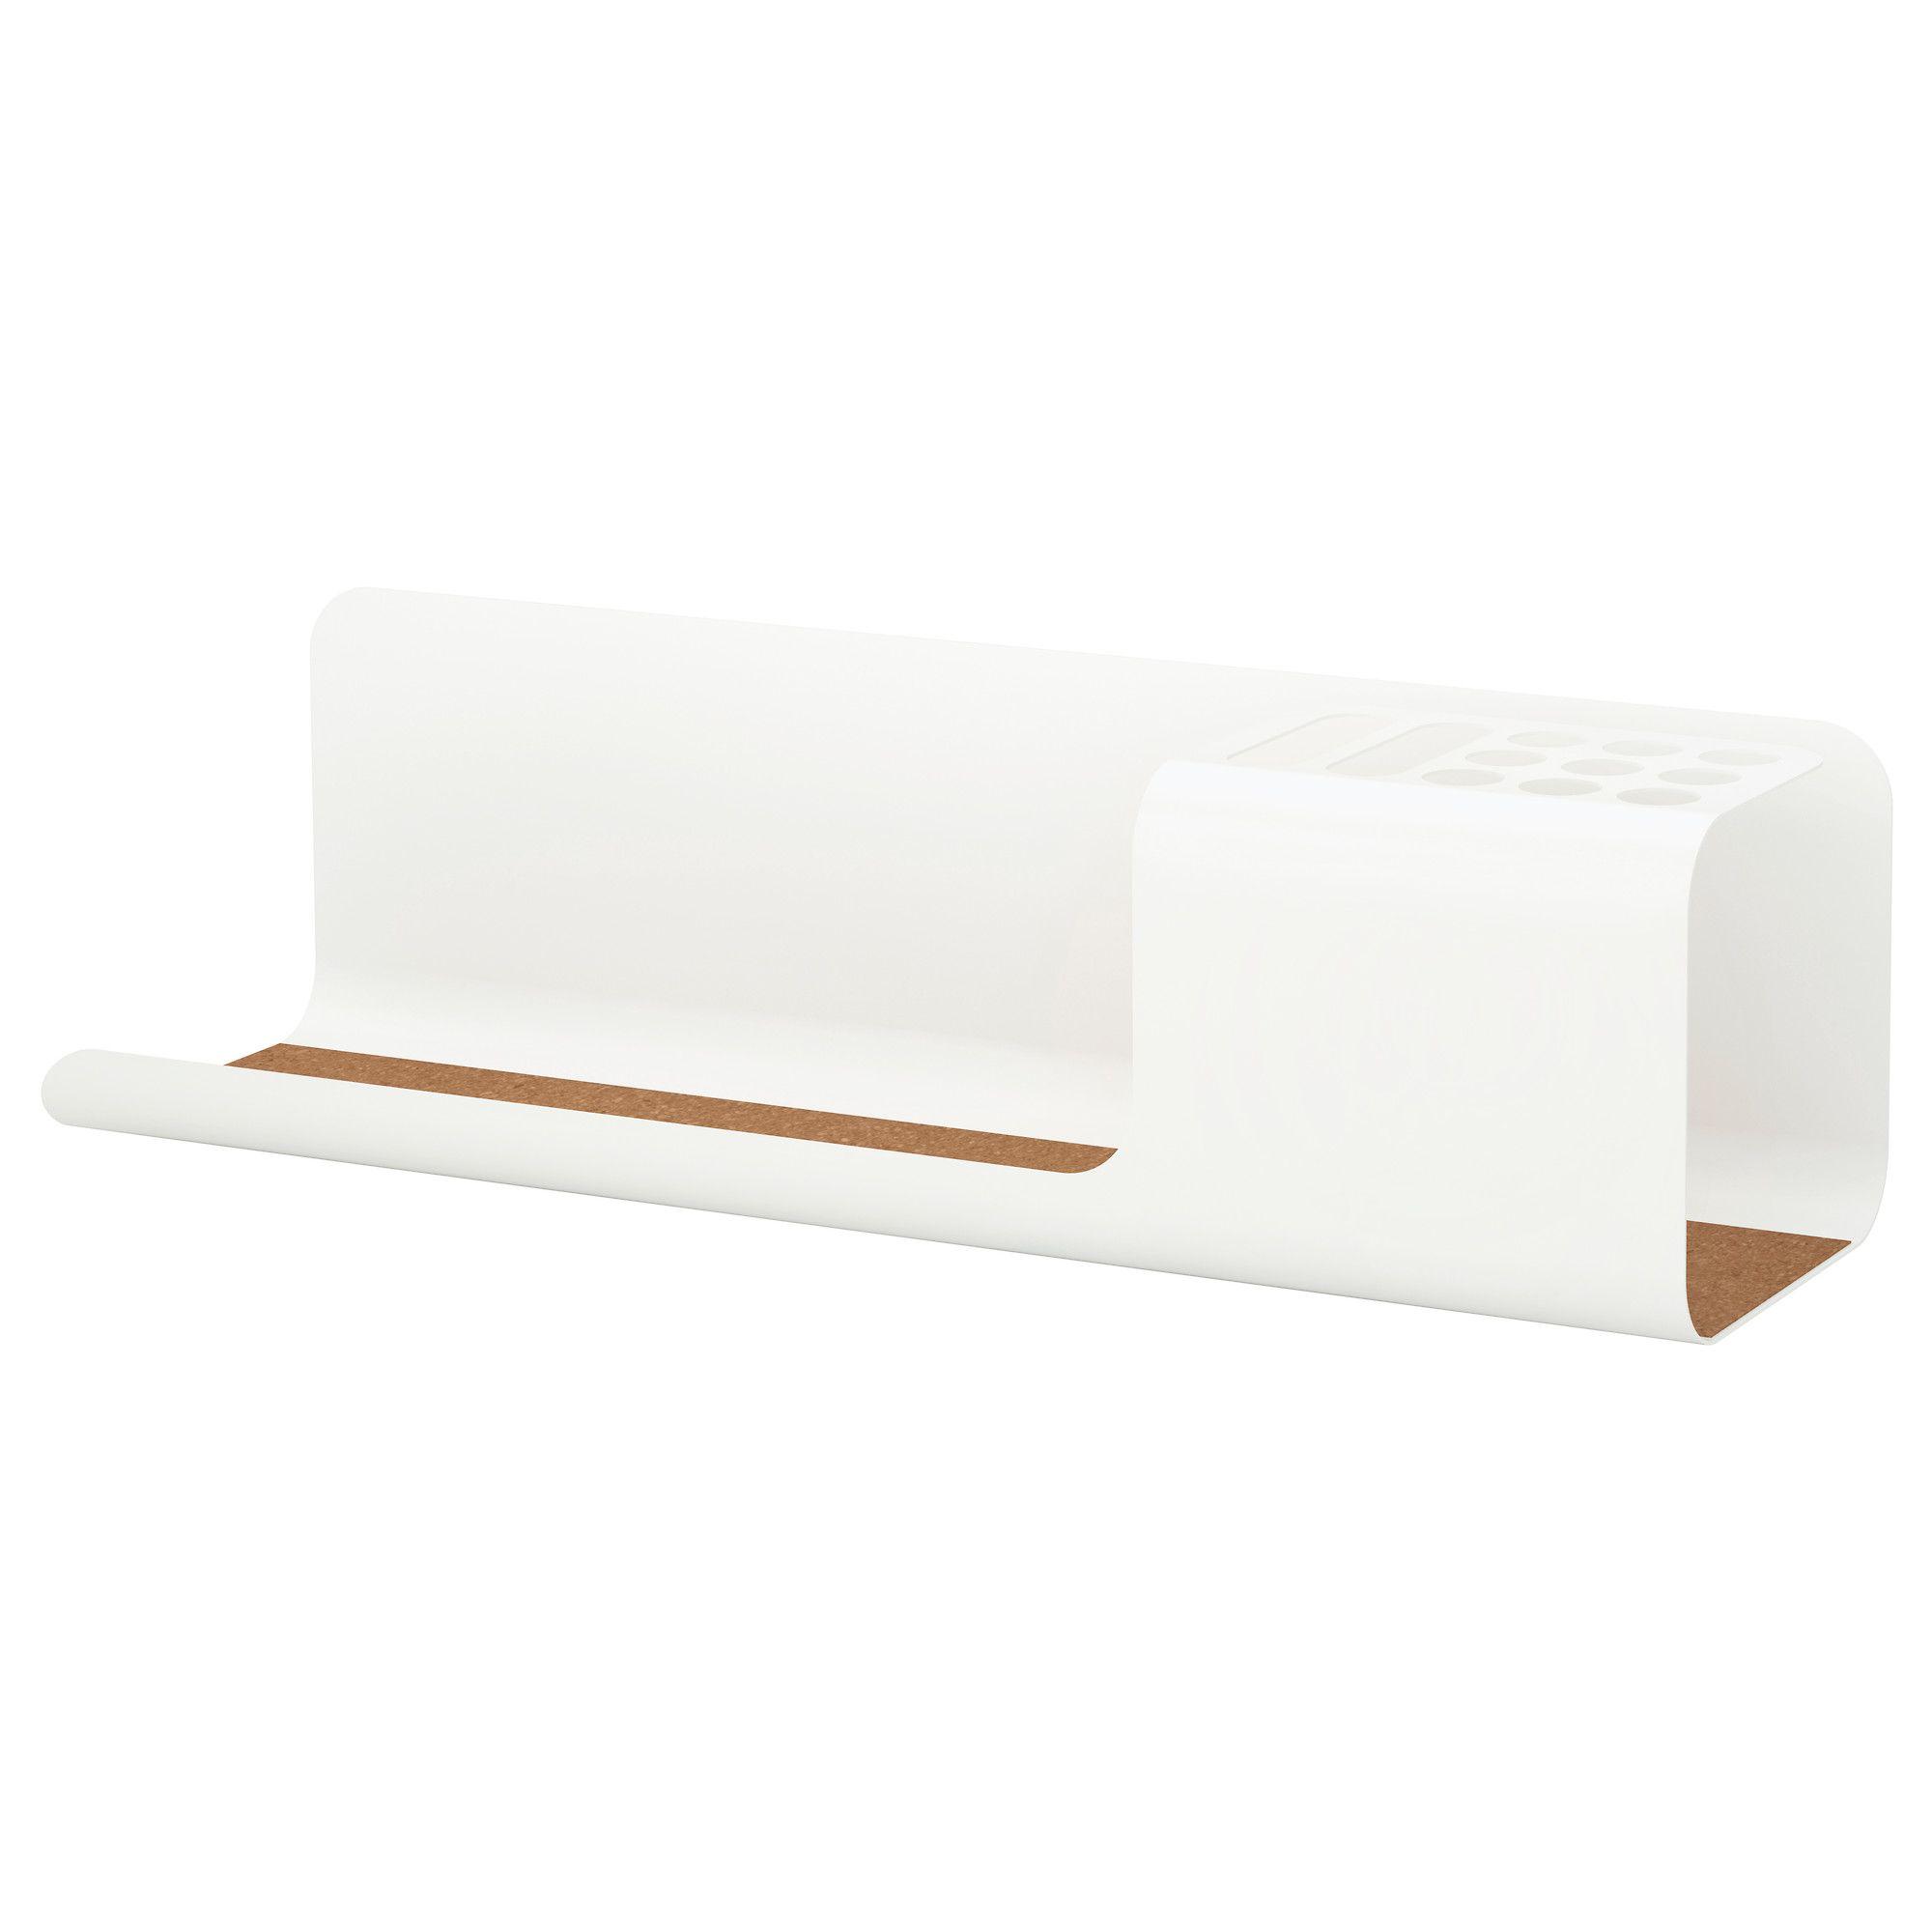 KVISSLE Bureauhouder - IKEA